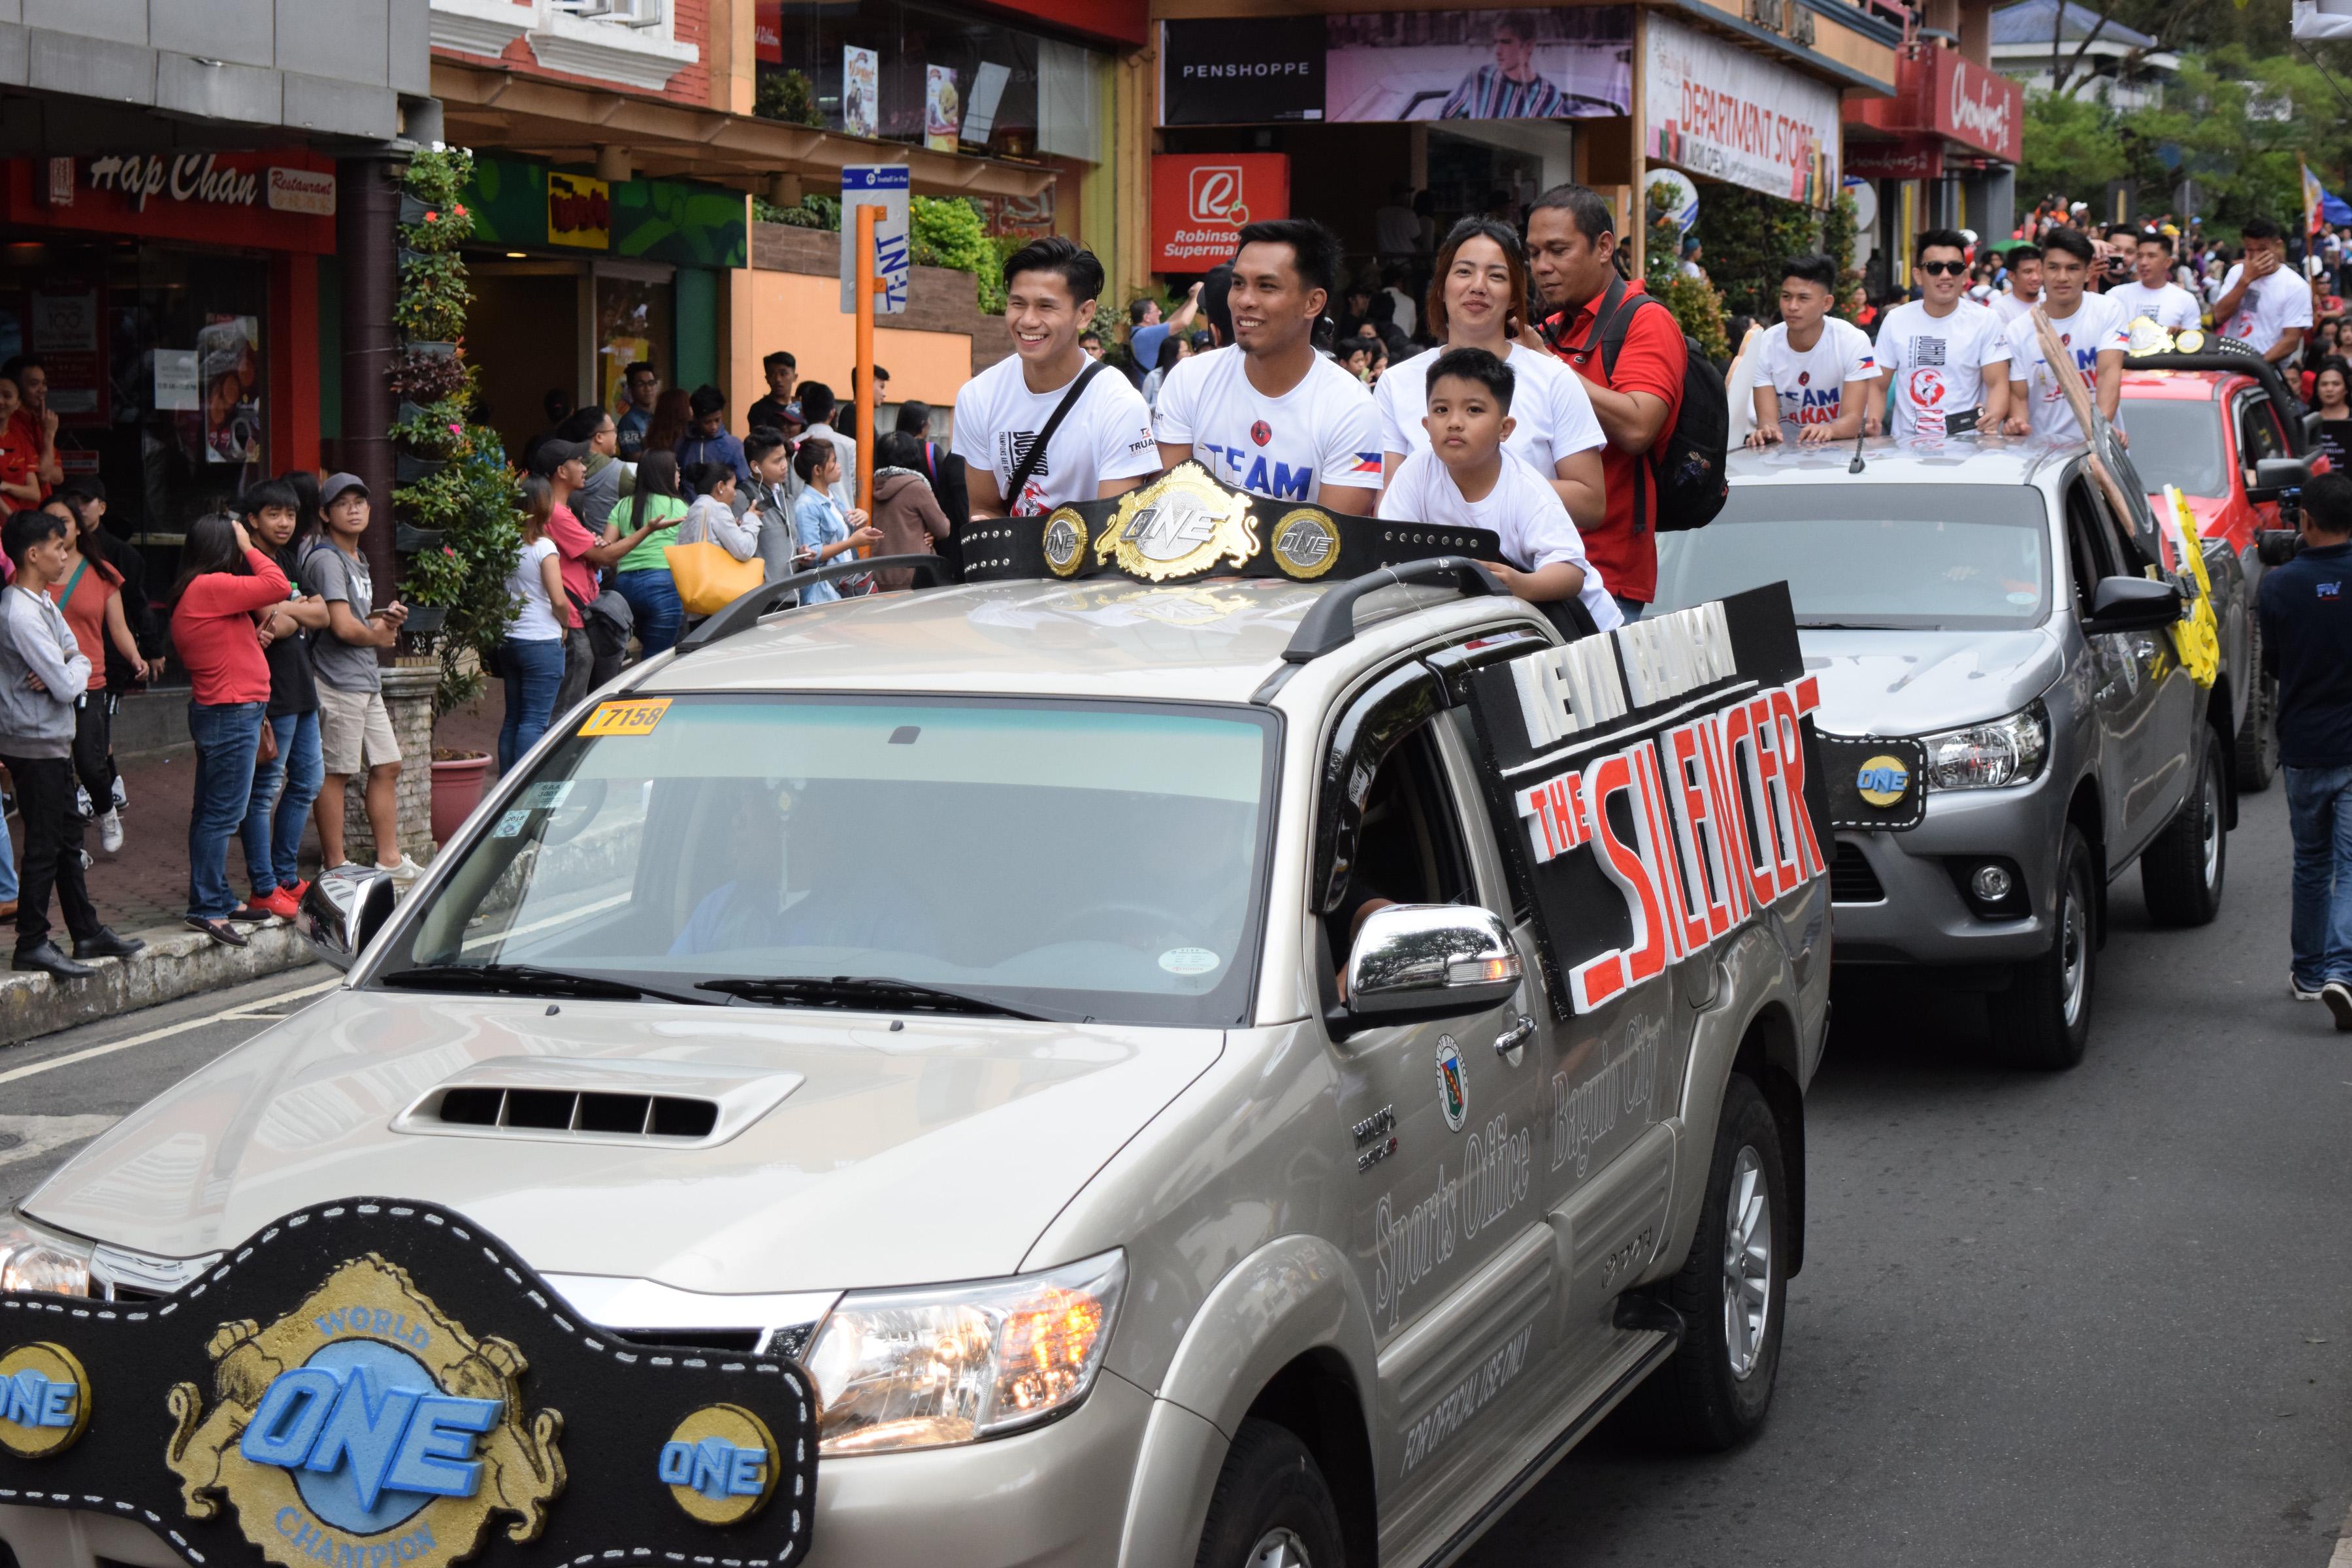 Tiebreaker Times Baguio City Parade celebrates Team Lakay Mixed Martial Arts News ONE Championship  Team Lakay Kevin Belingon Joshua Pacio John Cris Corton Geje Eustaquio Edward Kelly Danny Kingad